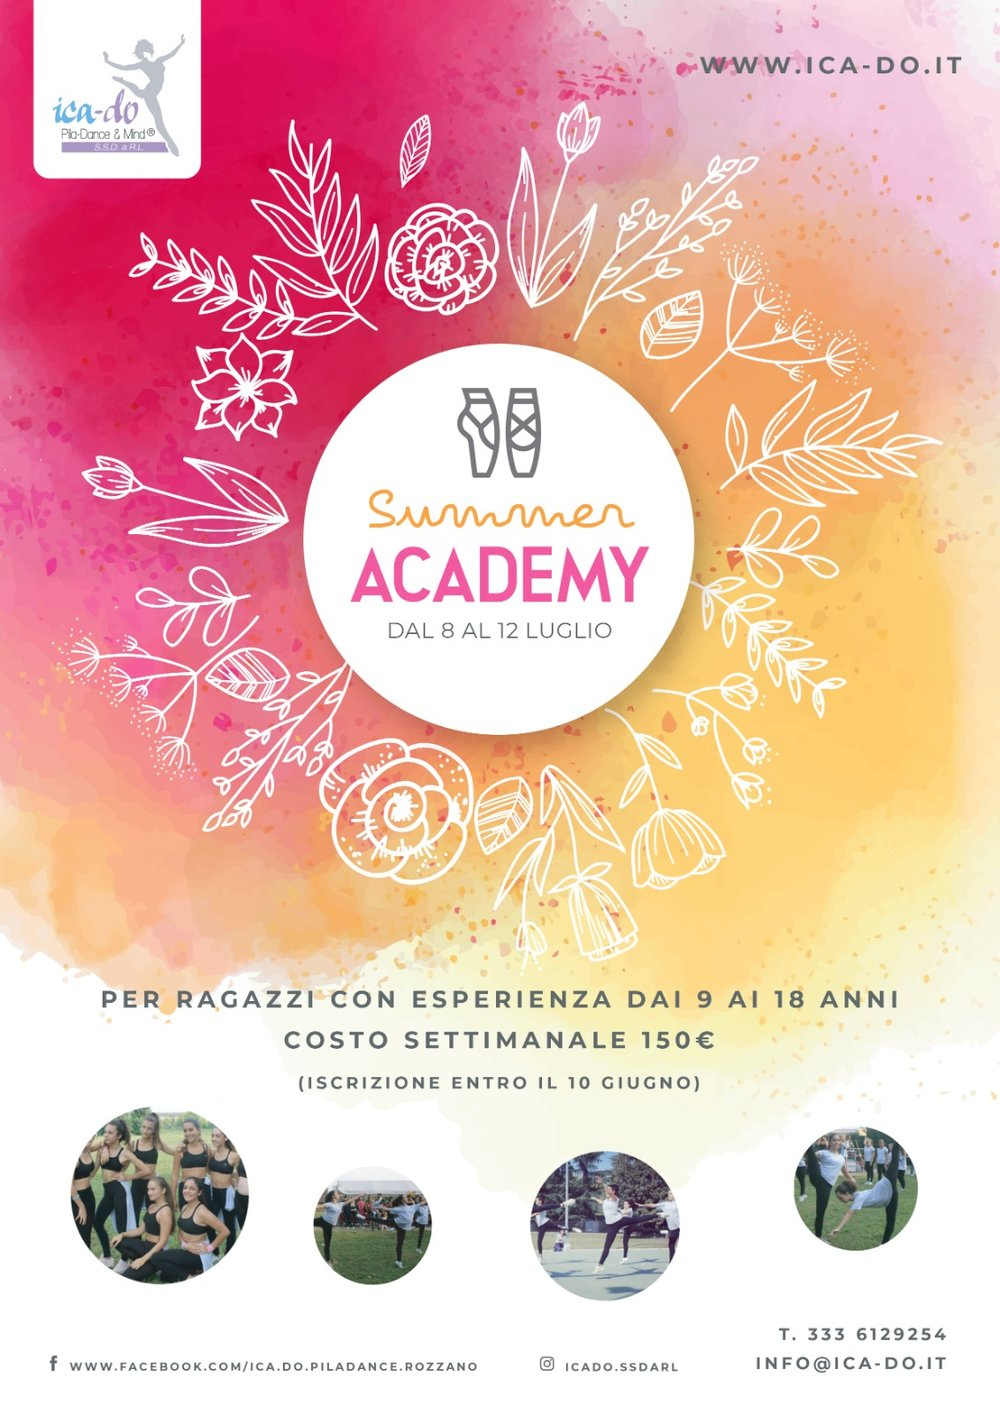 summer-accademy-2019-ica-do-rozzano.jpeg